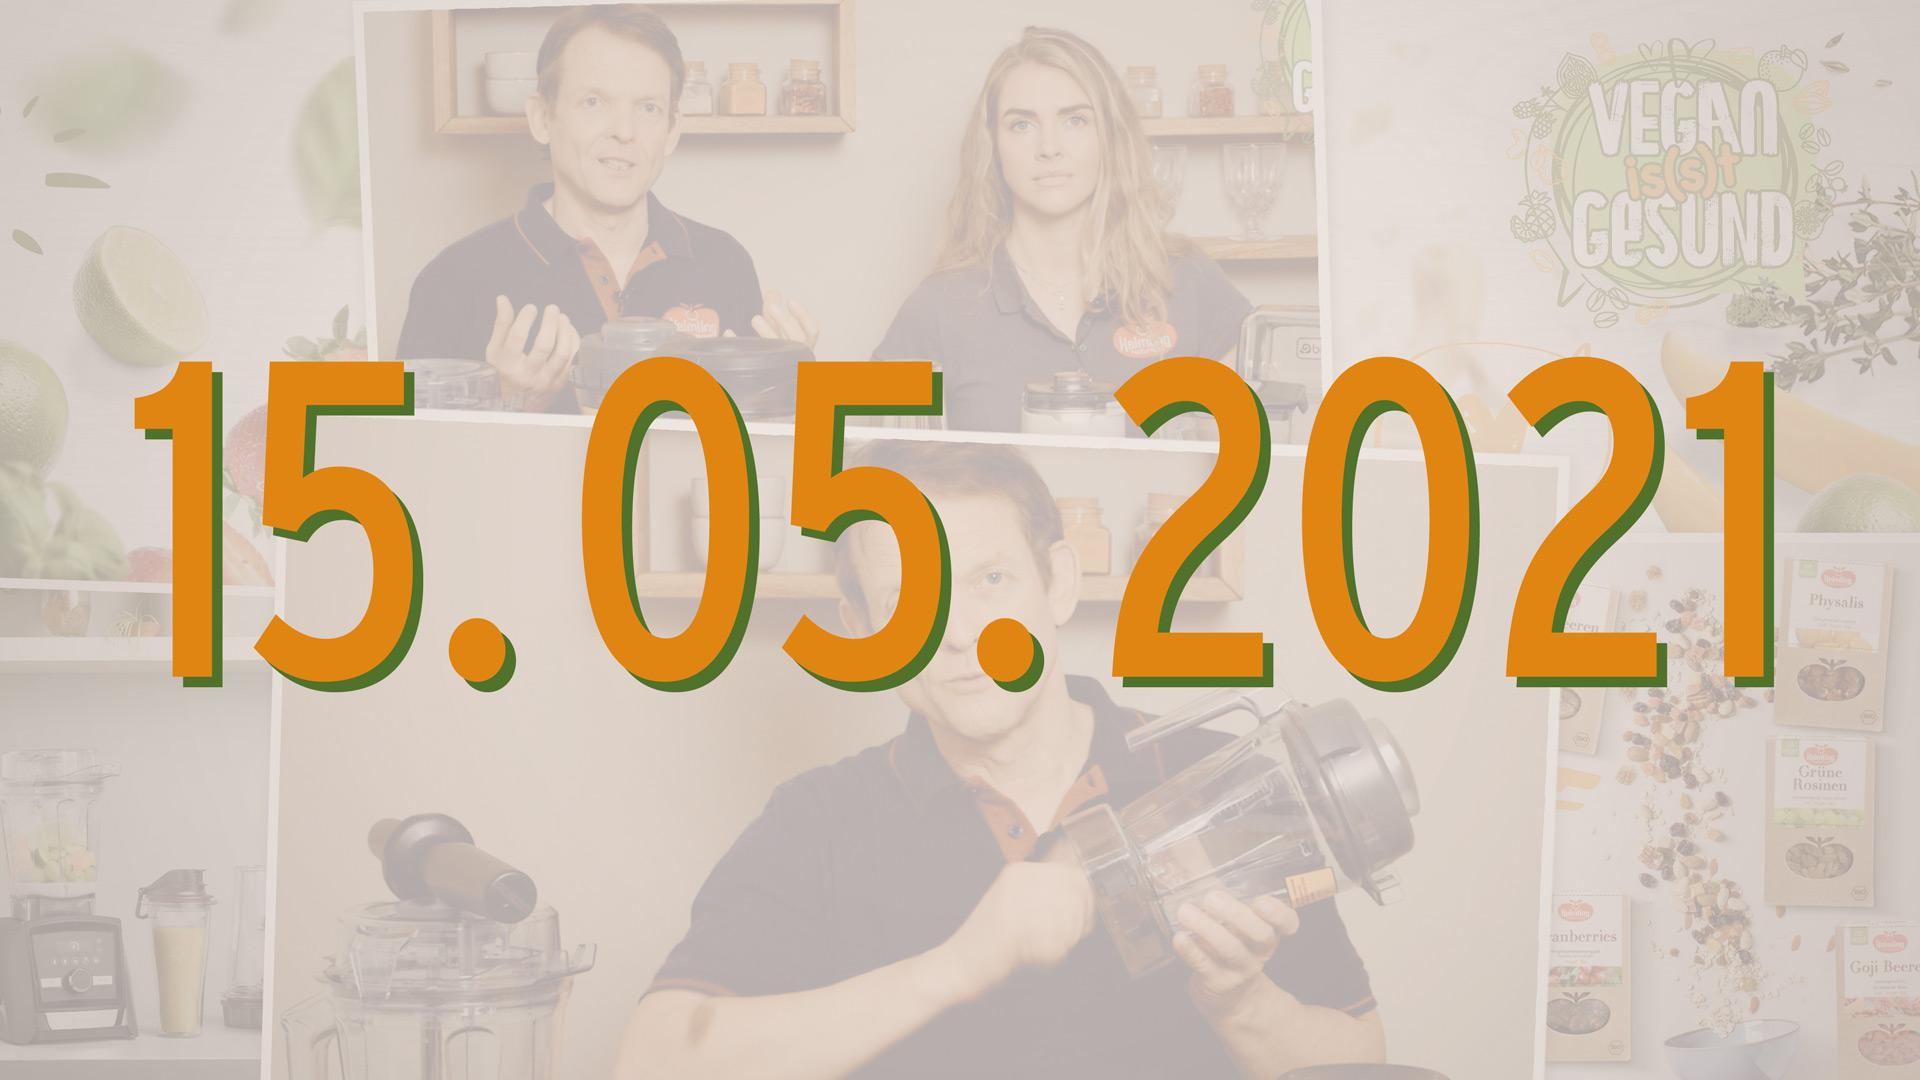 Video-Start 15.05.2021